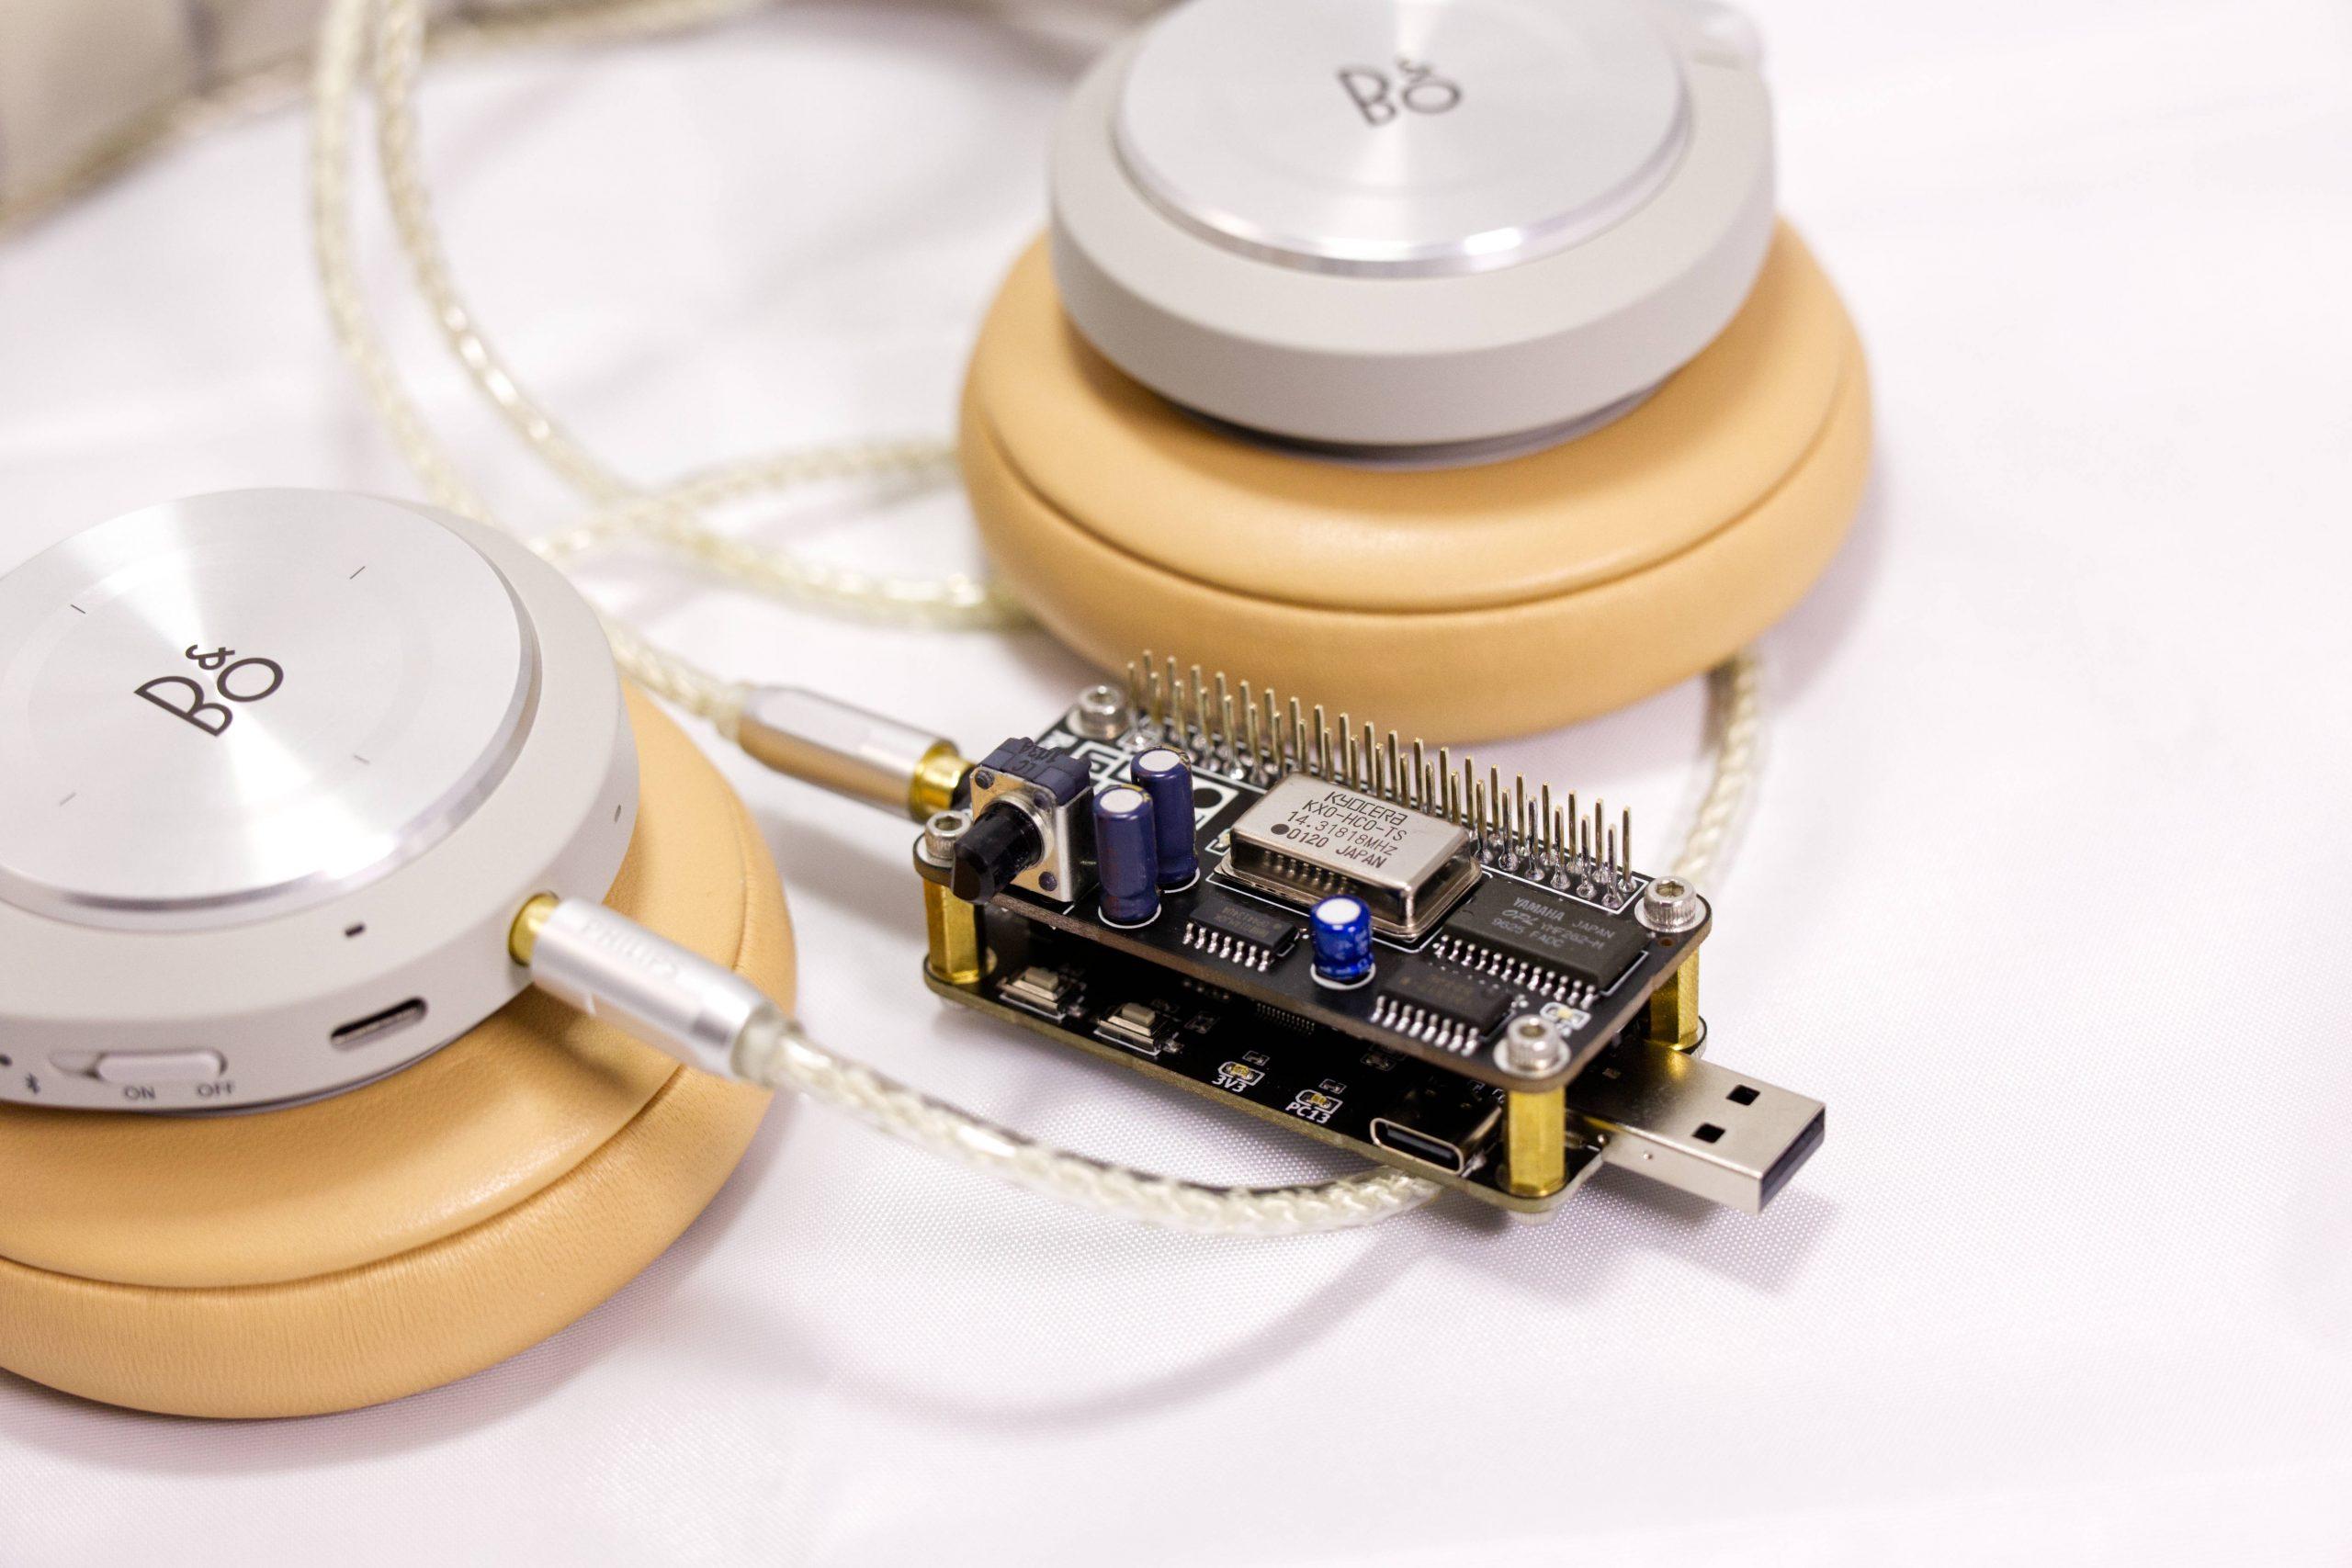 RetroWave OPL3 Sound Card Setup